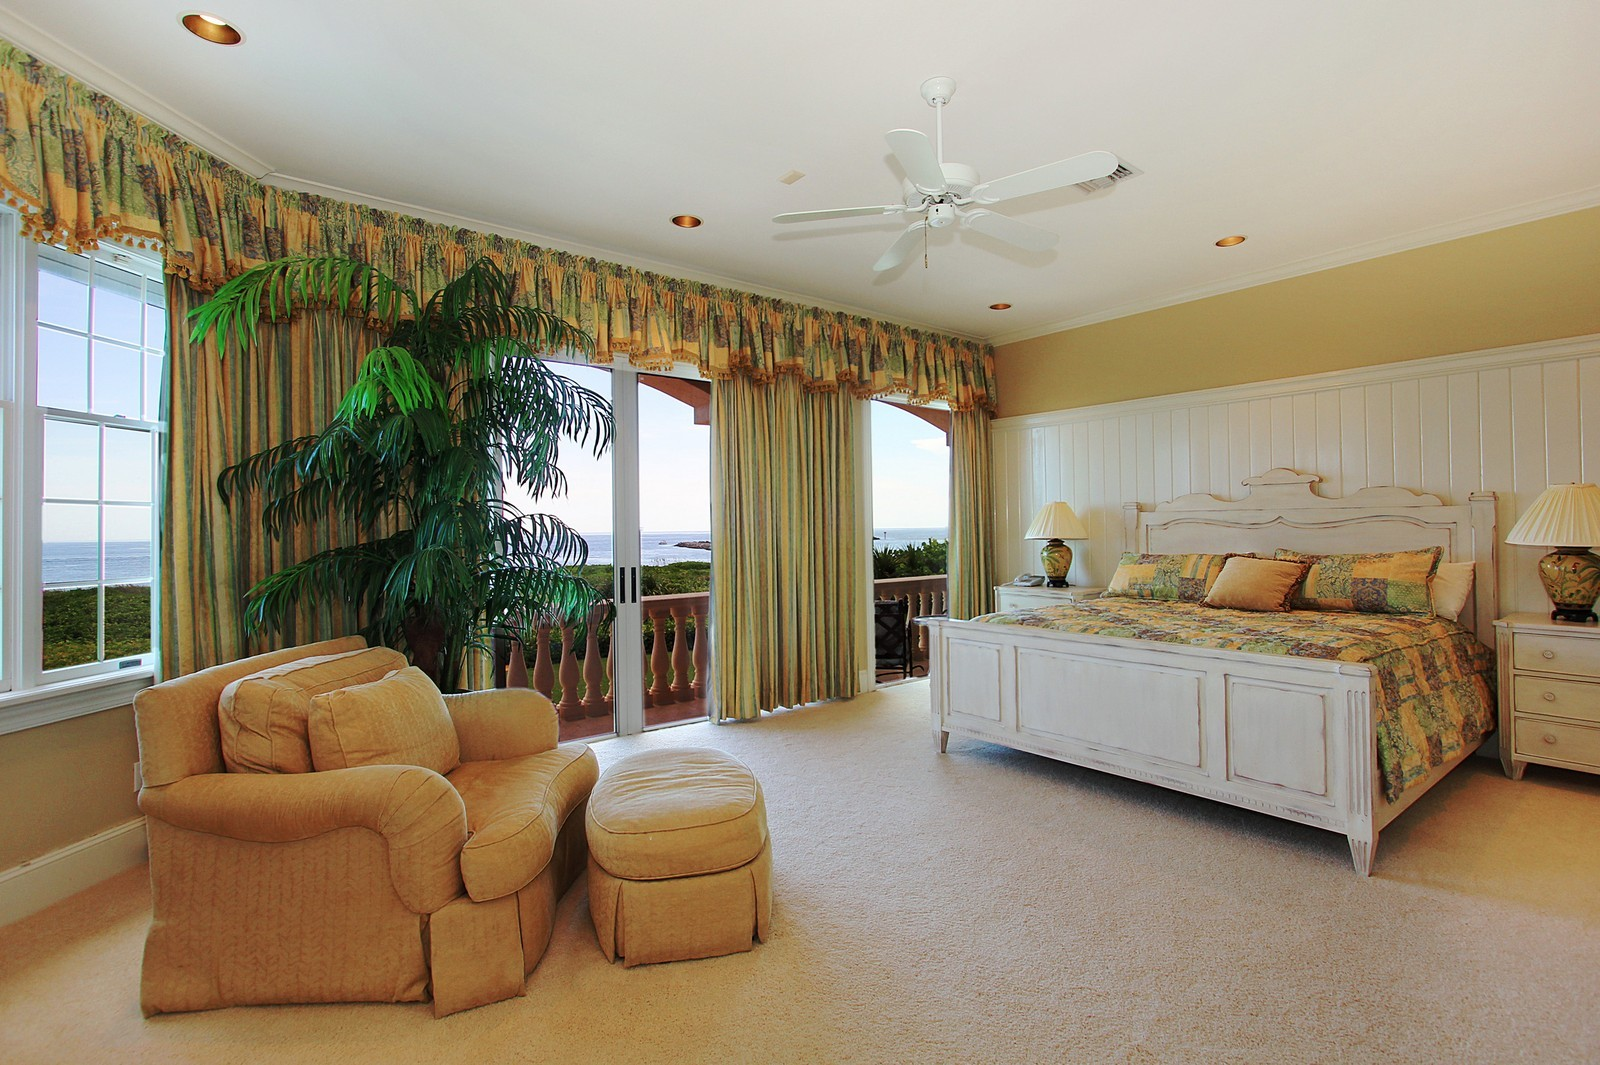 Real Estate Photography - 3047 SE Island Point Lane, Stuart, FL, 34996 - Guest House Bedroom